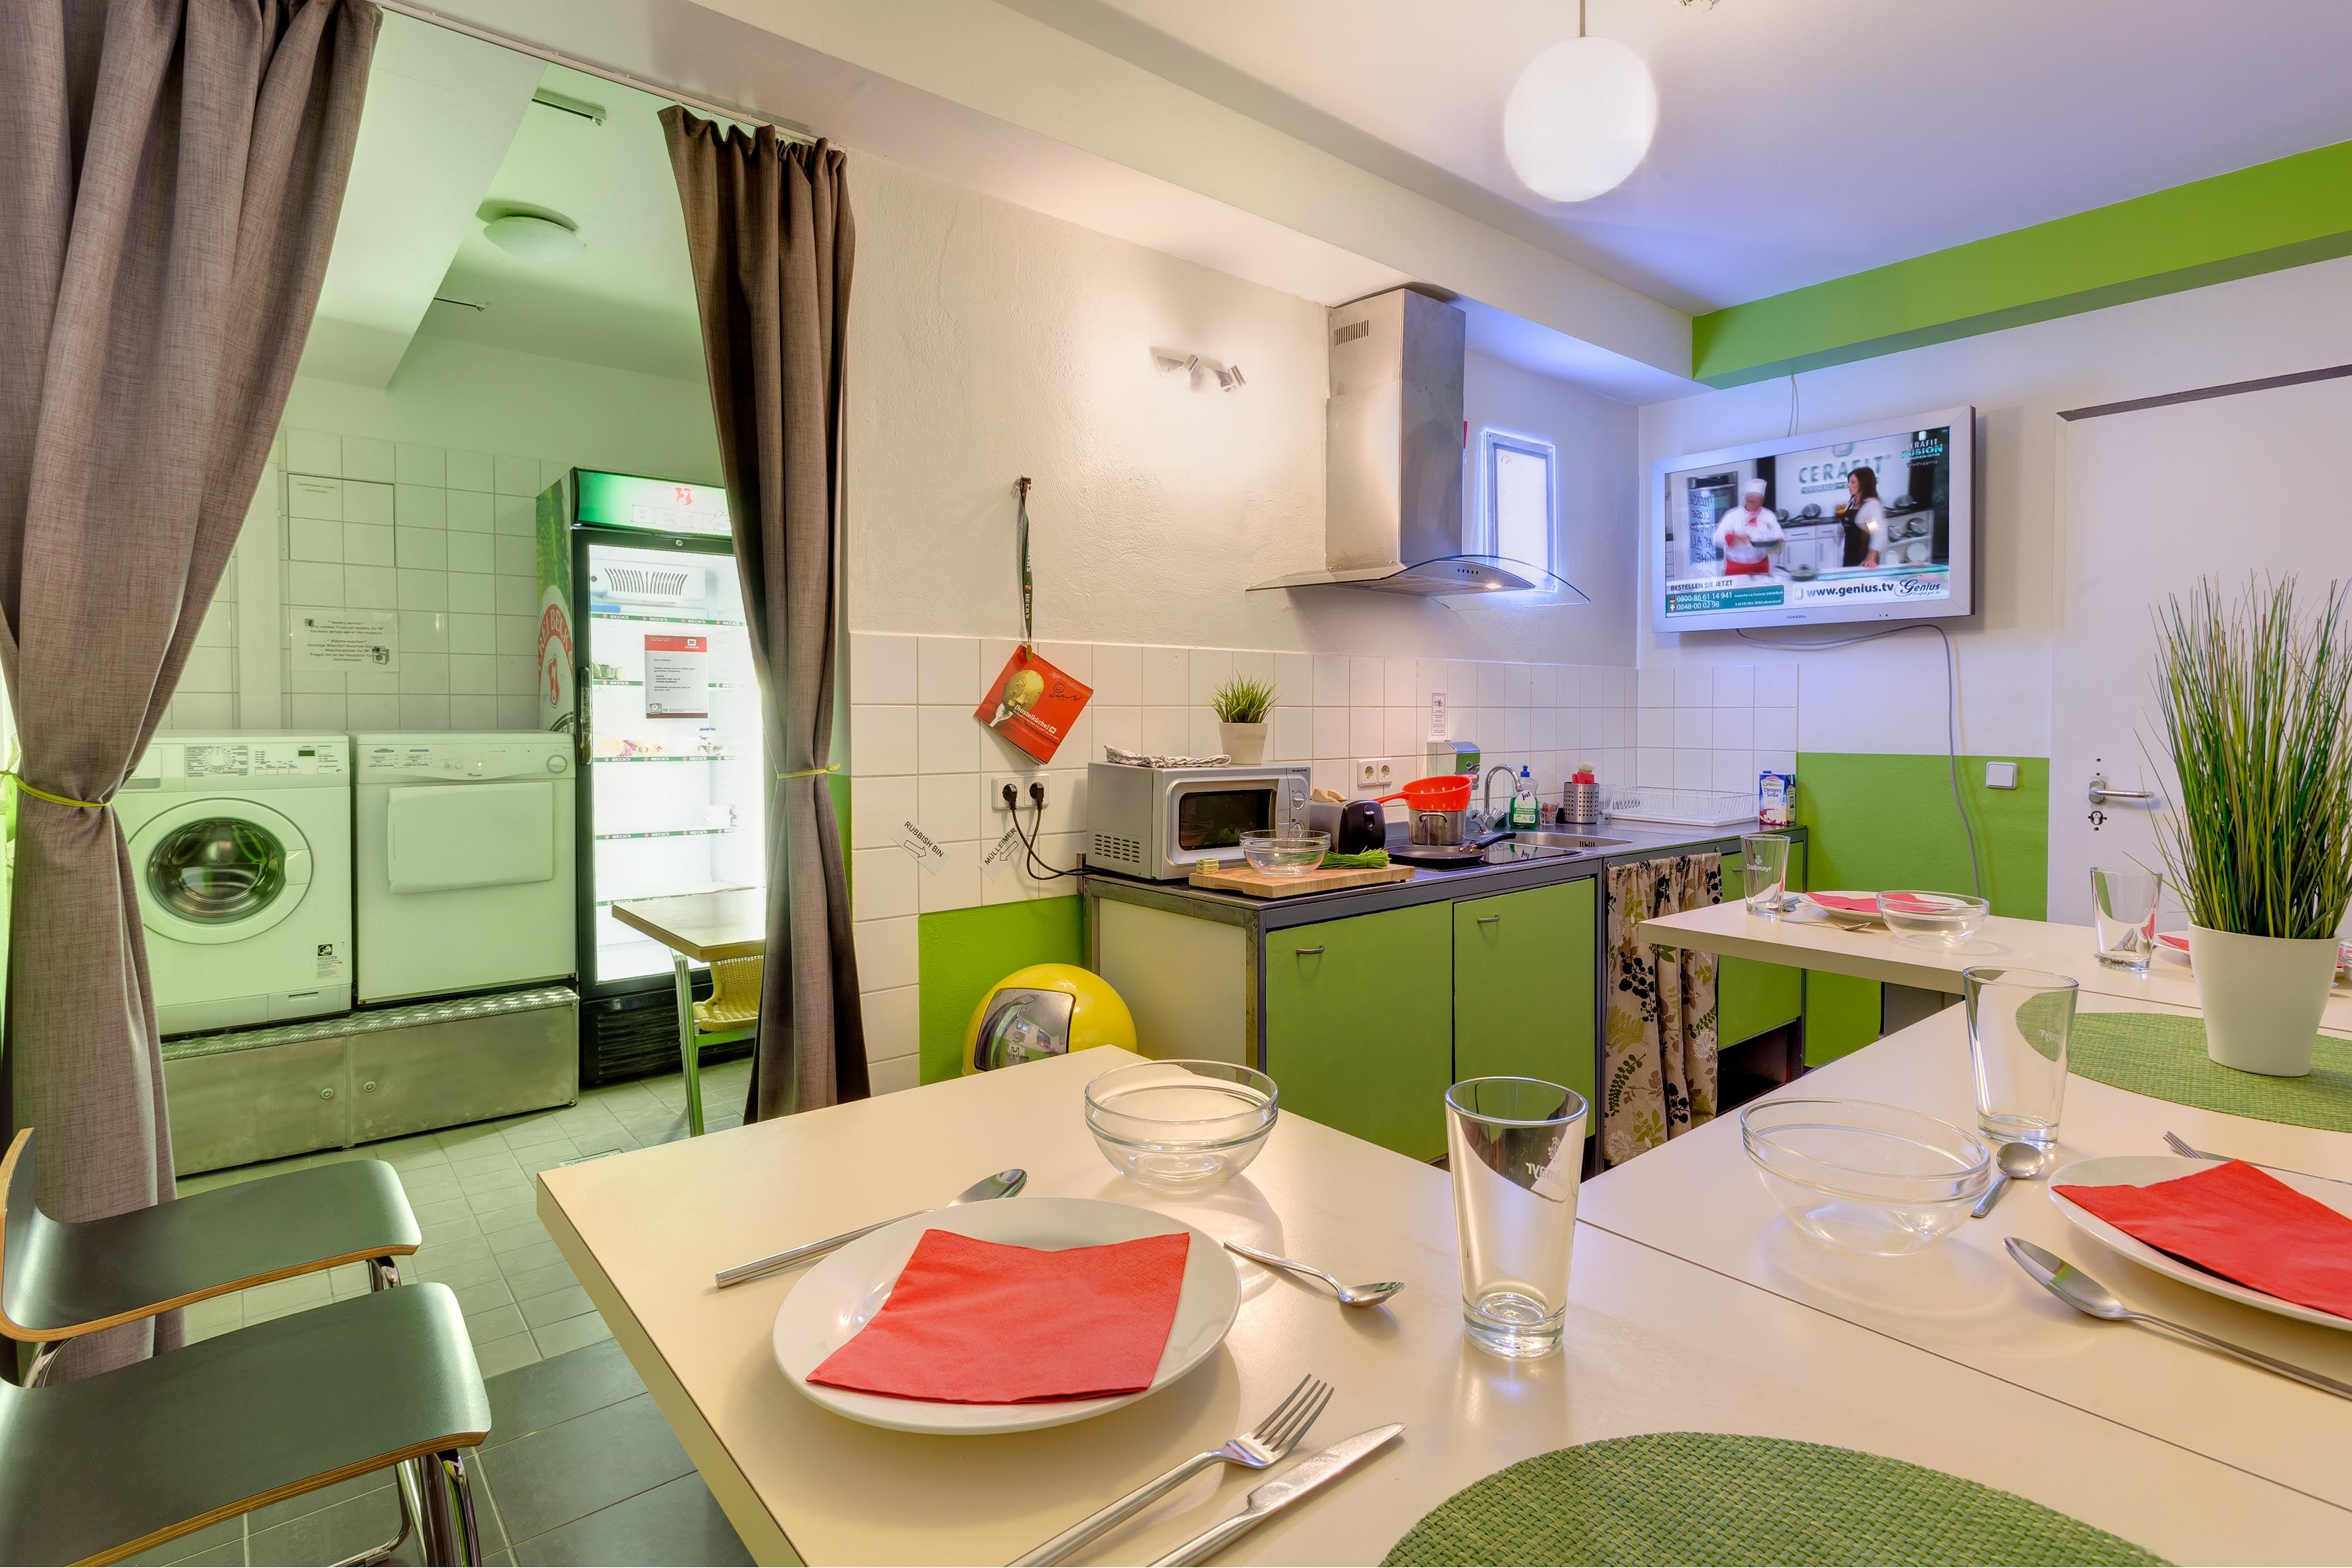 MEININGER Hotel Berlin Alexanderplatz - Guest kitchen